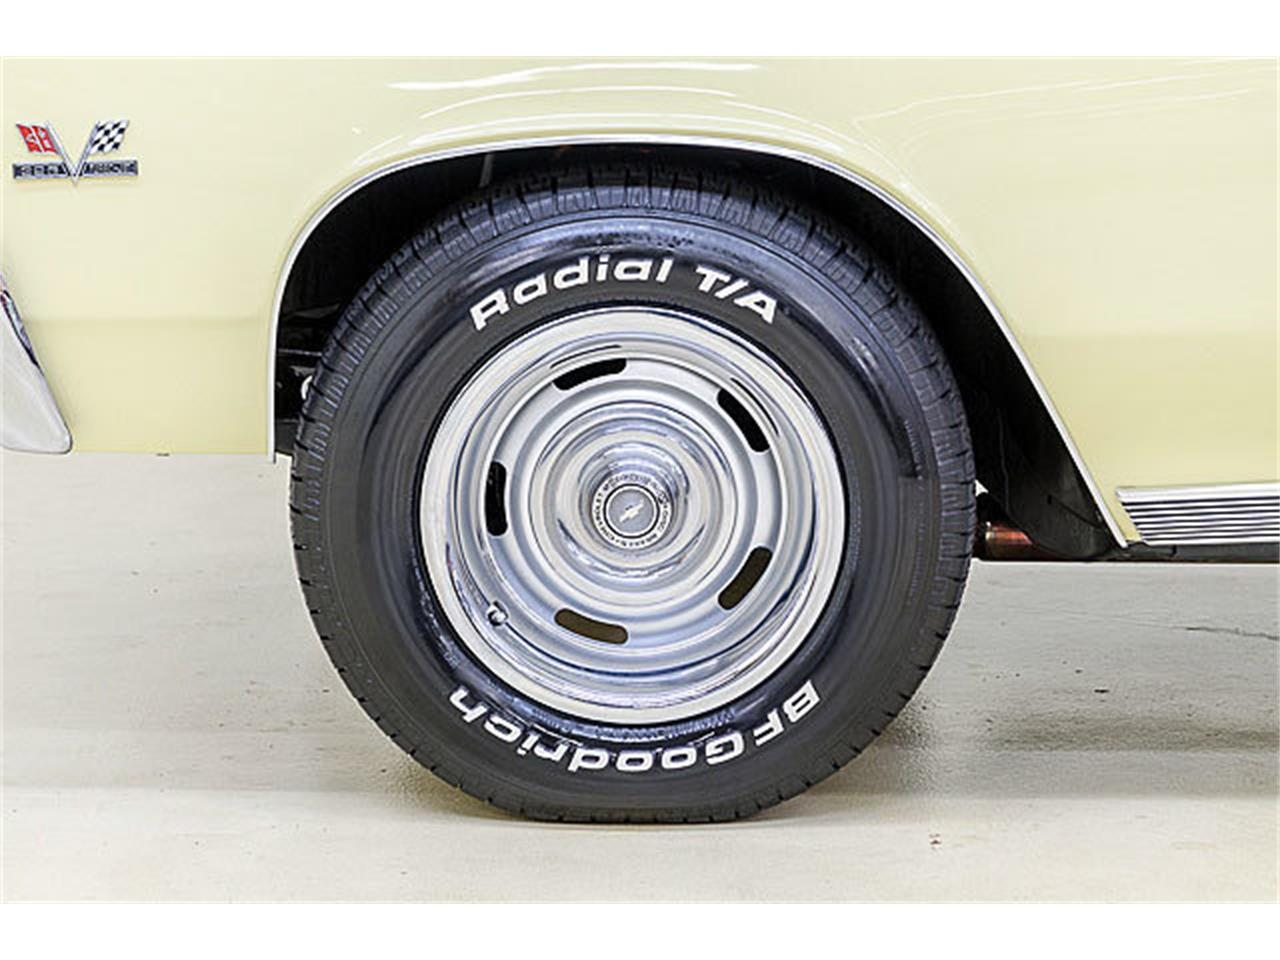 Large Picture of Classic 1967 Chevelle located in Concord North Carolina - $54,995.00 - JUL8